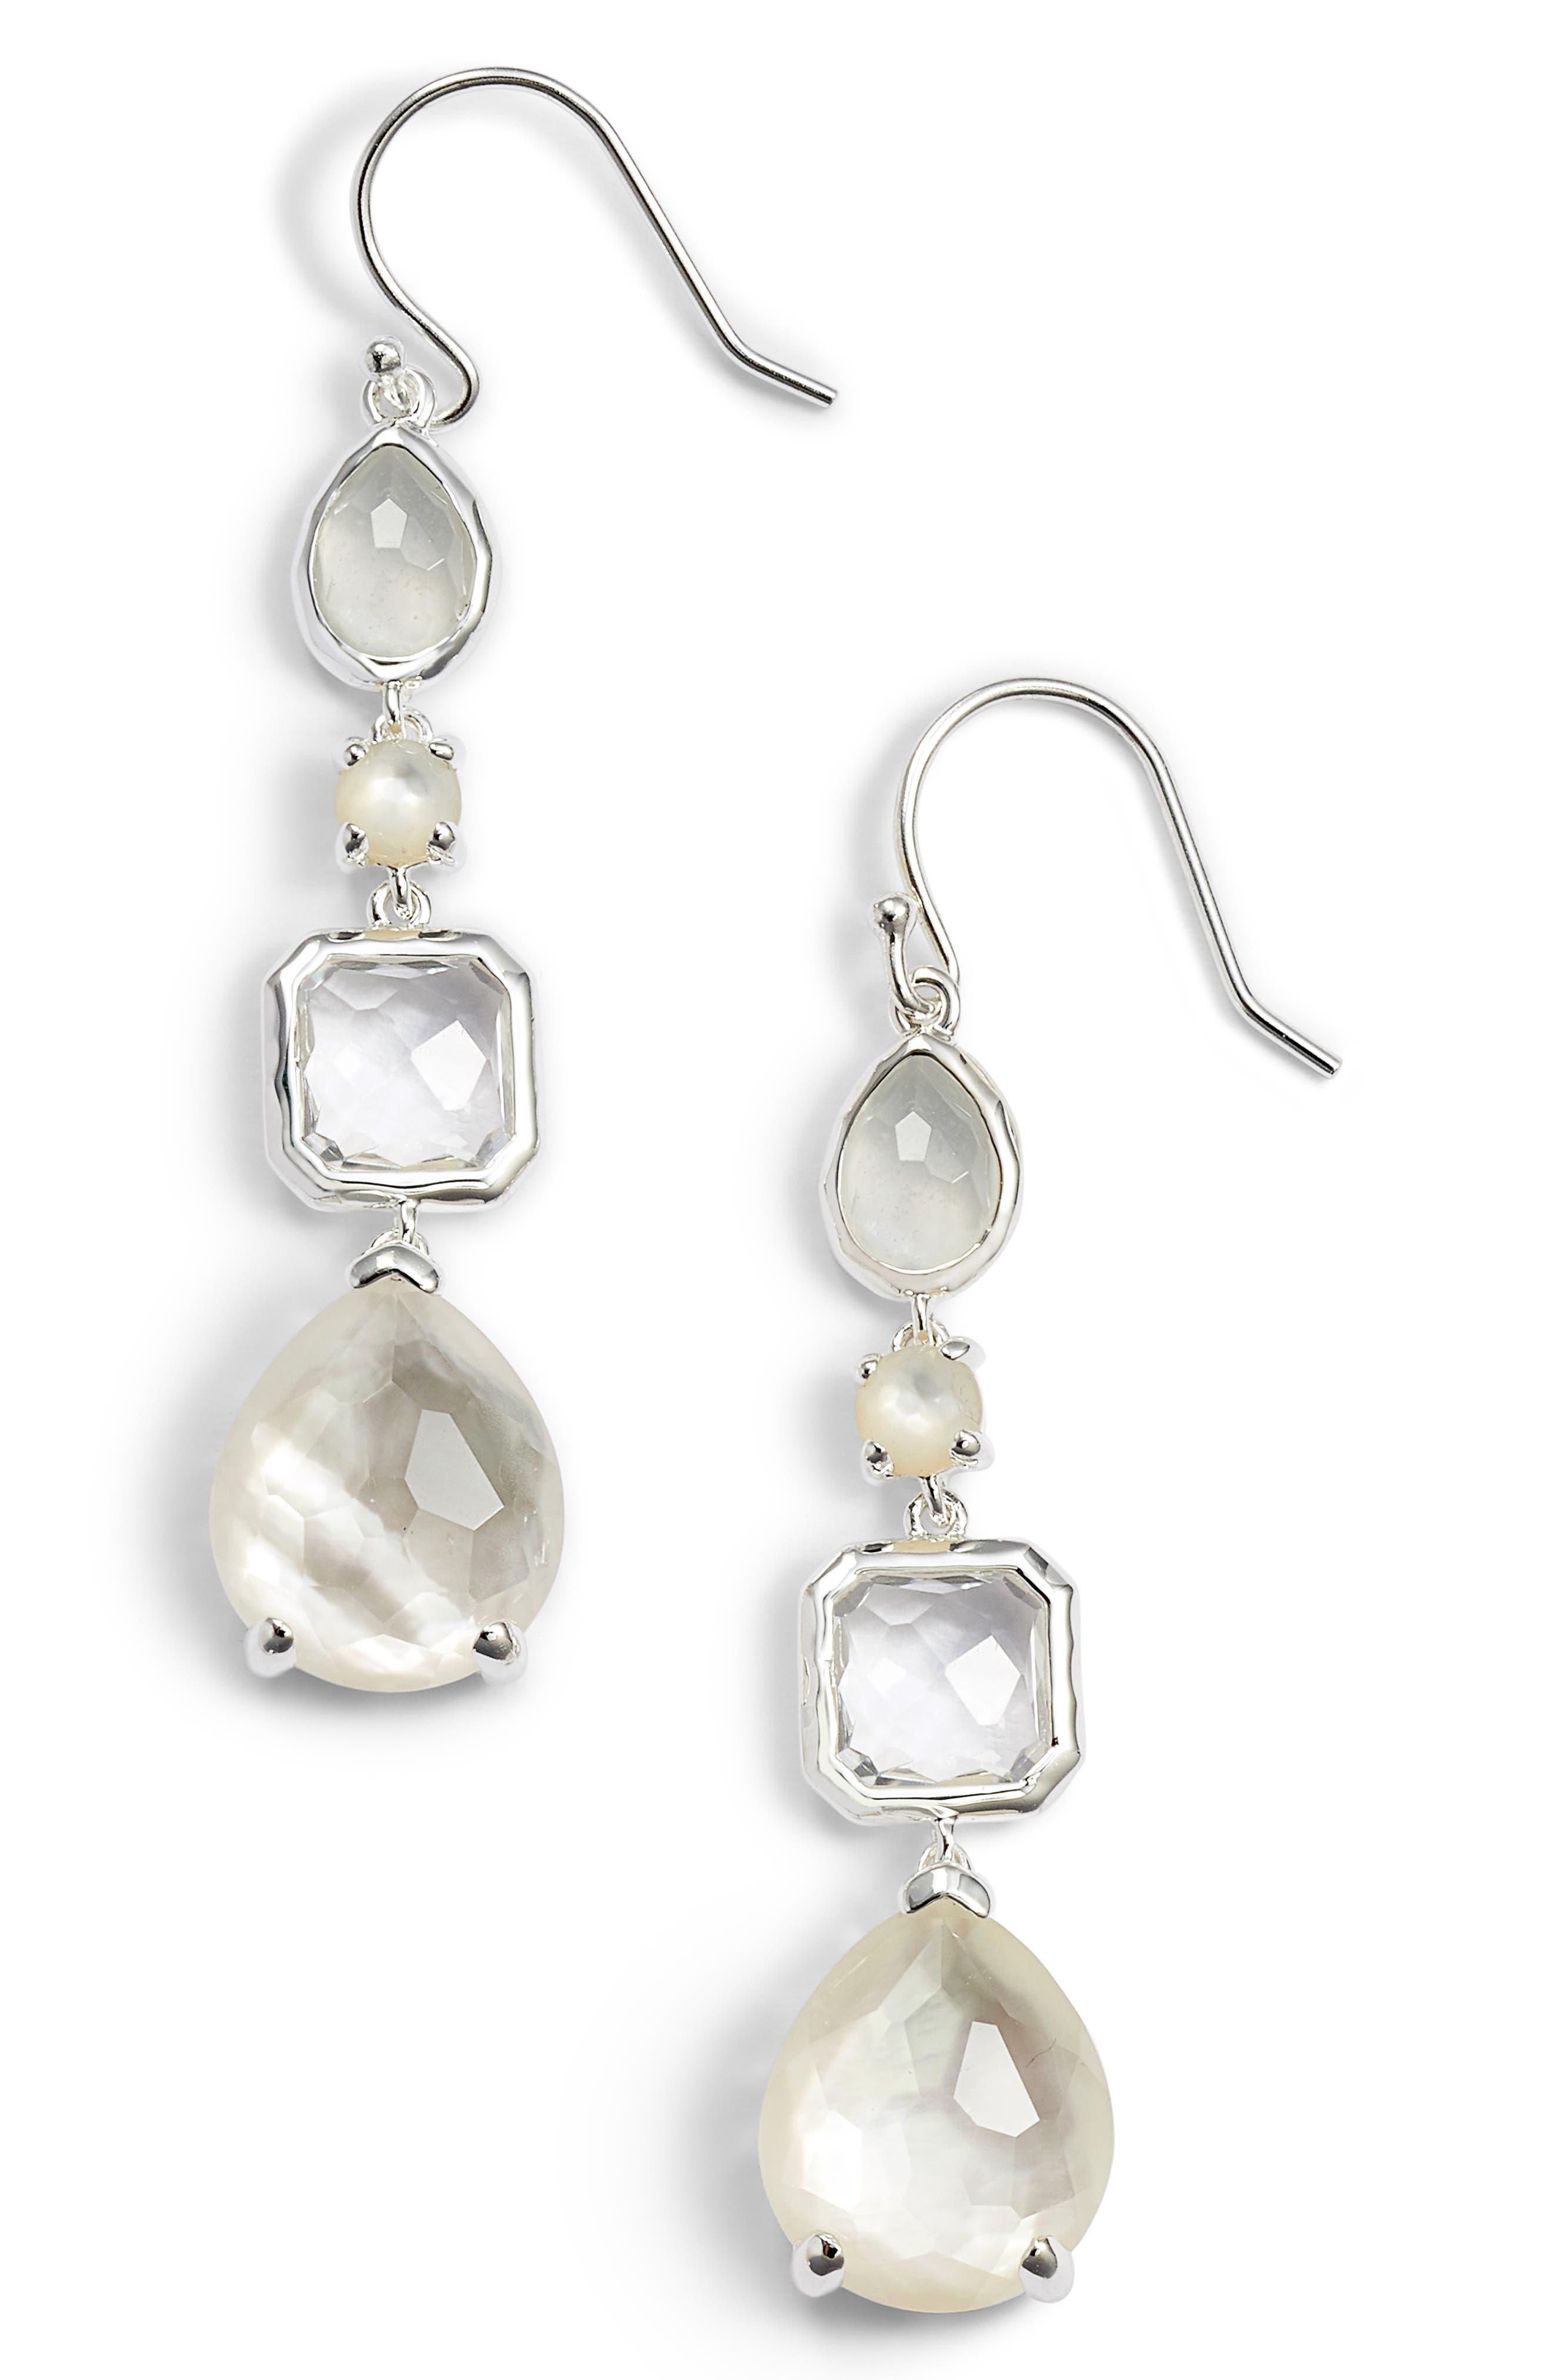 'Rock Candy' Semiprecious Stone Linear Drop Earrings,                             Main thumbnail 1, color,                             650